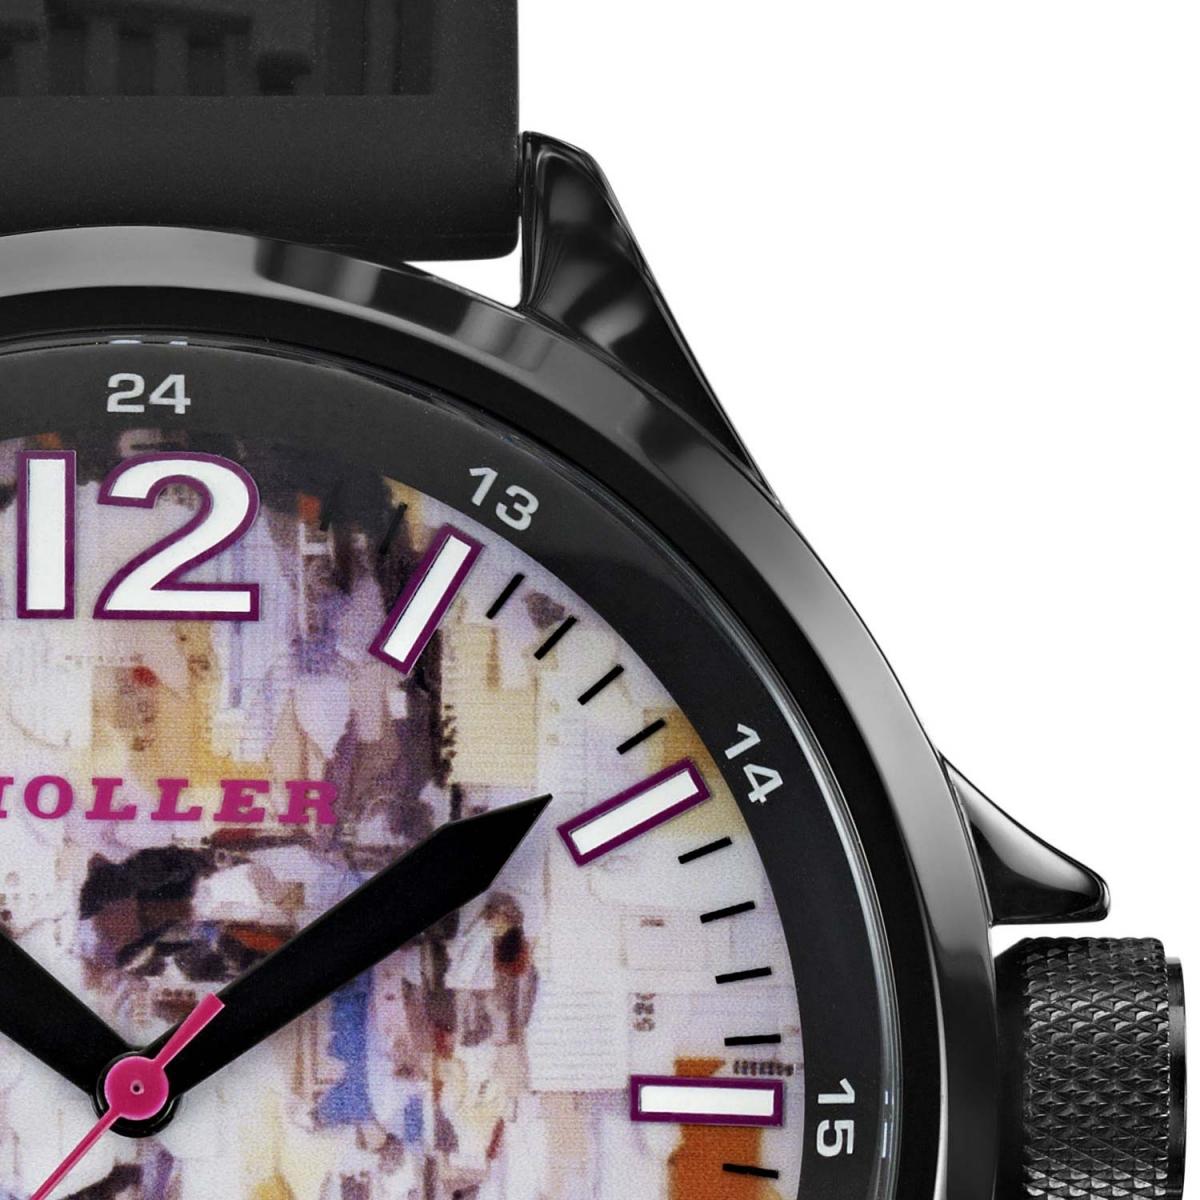 Holler Crazies TI Watch